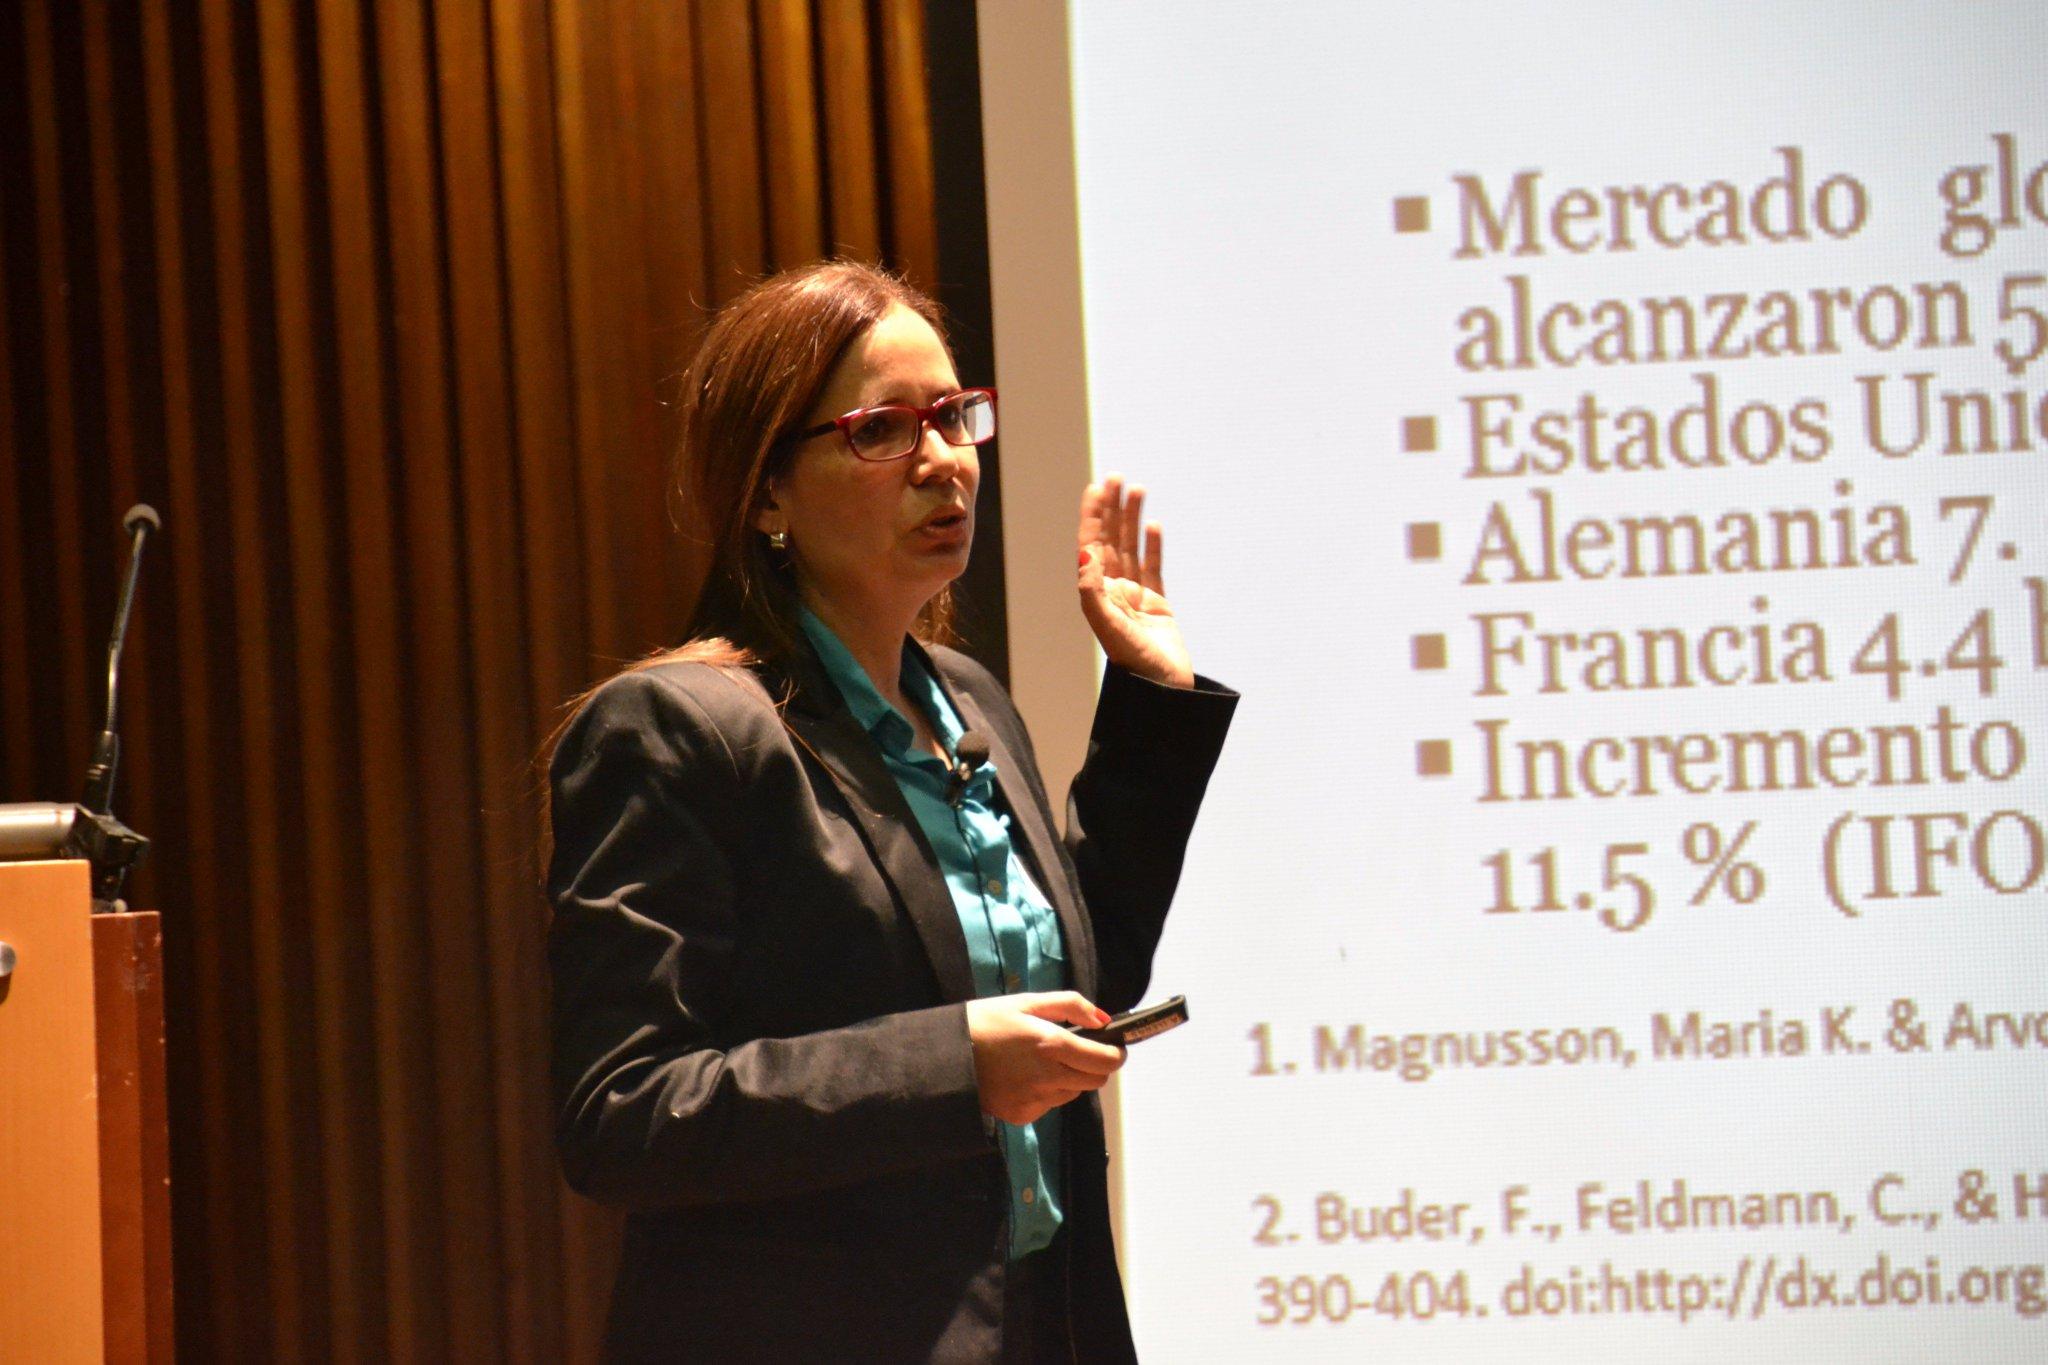 Interviene Ligia Gómez, profesora de @usantiagodecali Simposio #CrecimientoVerde #EnVivo: https://t.co/kMvlsVZiTq https://t.co/Y0MLSeO7F2